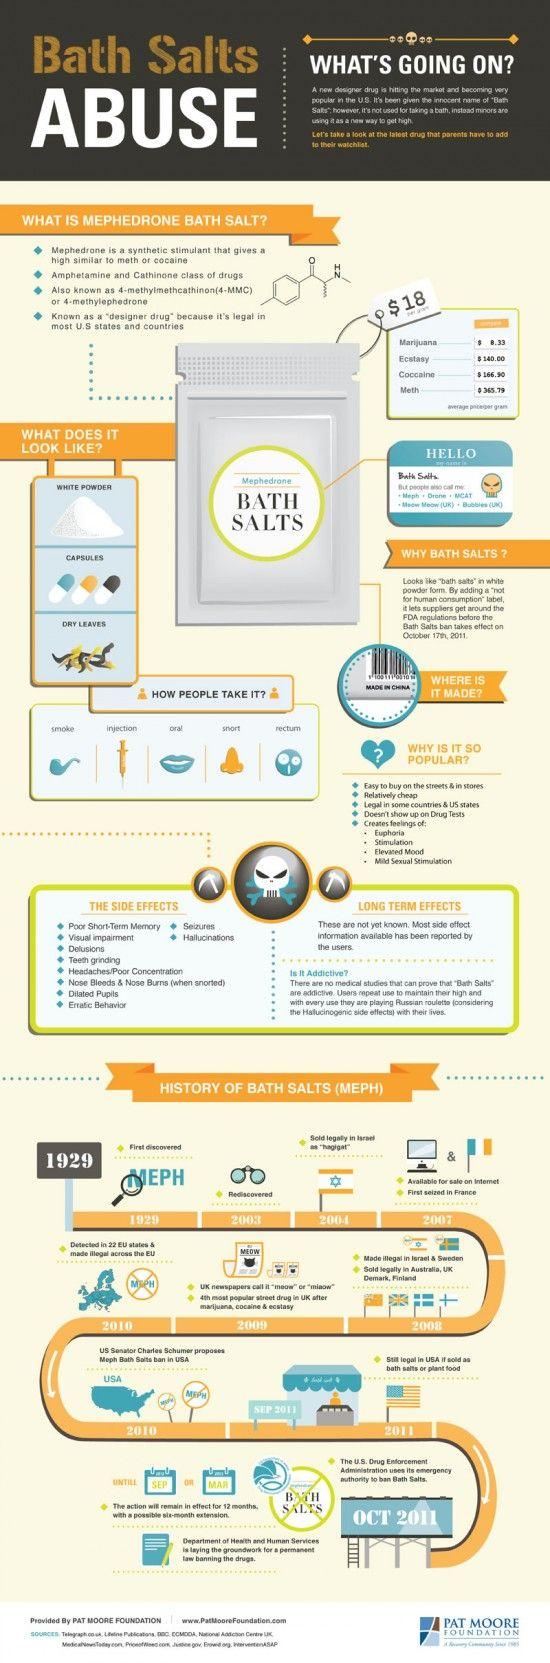 19 best bath salts images on pinterest bath salts addiction